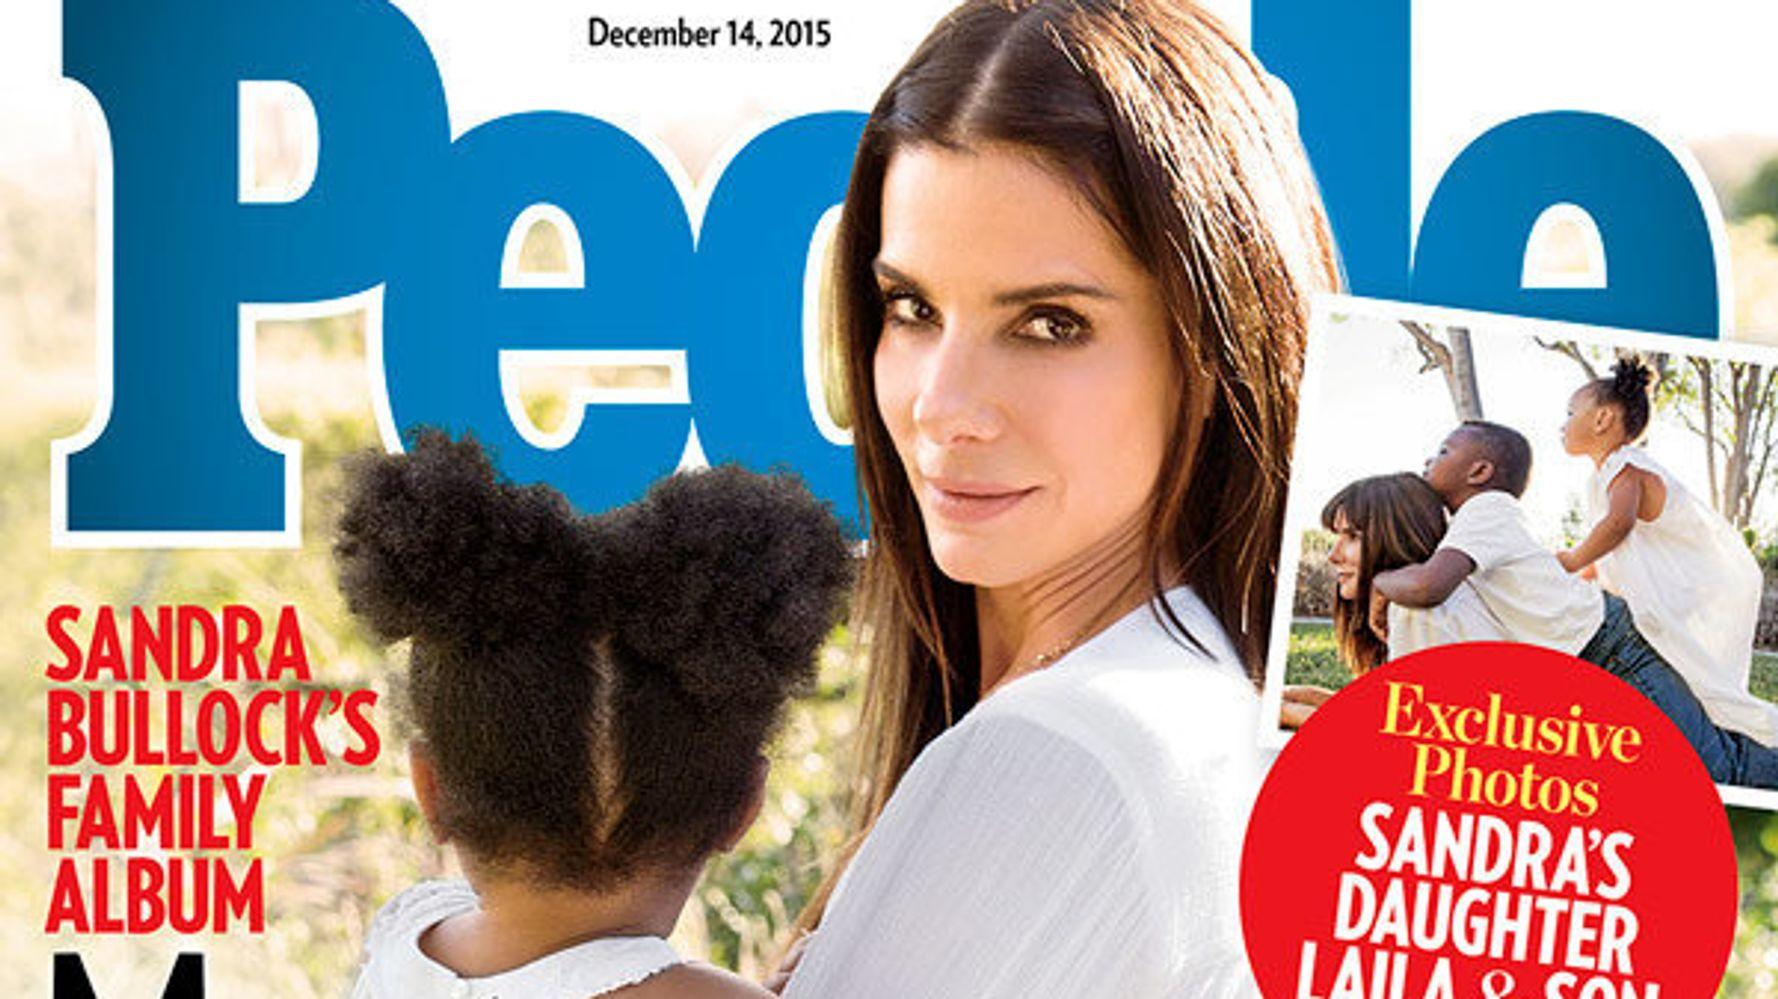 Sandra Bullock Adopts 3-Year-Old Daughter Named Laila | HuffPost